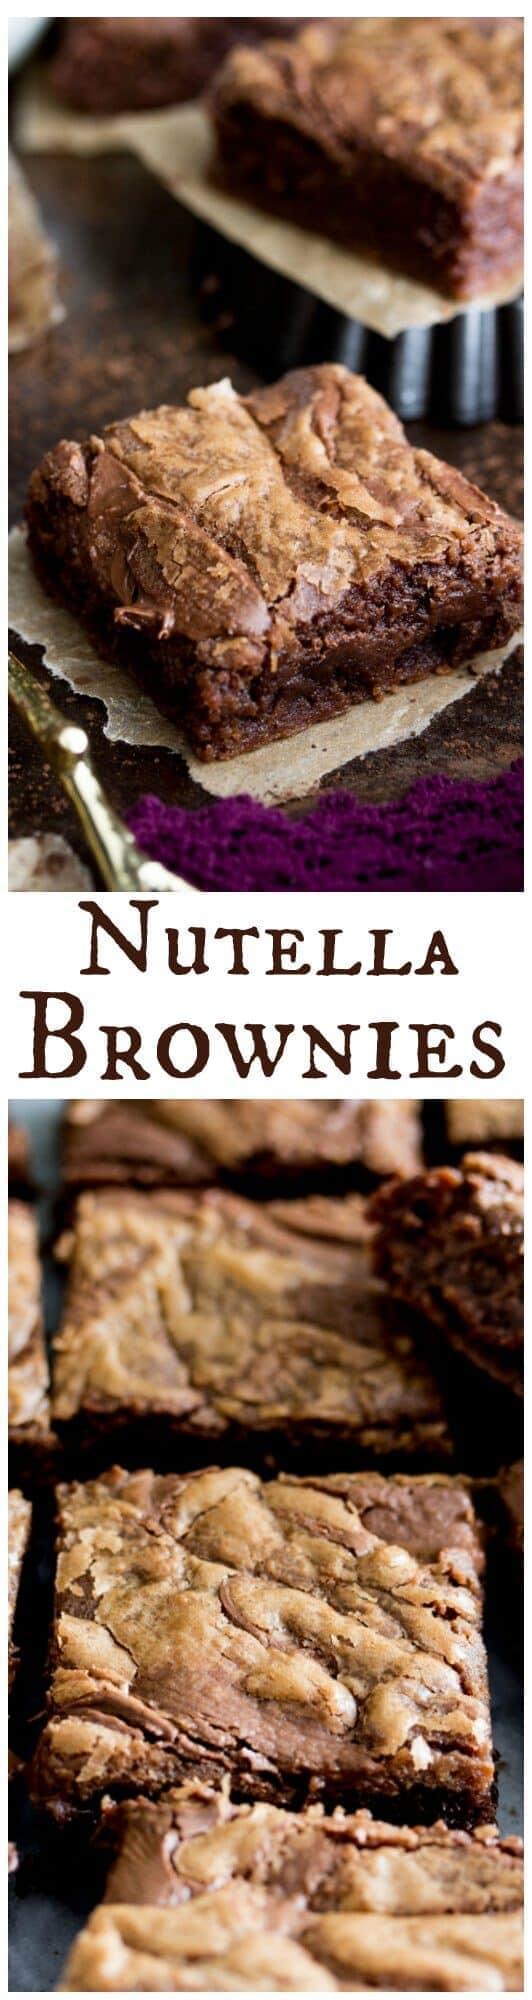 Nutella Brownies -- rich Nutella flavor baked into bars || Sugar Spun Run